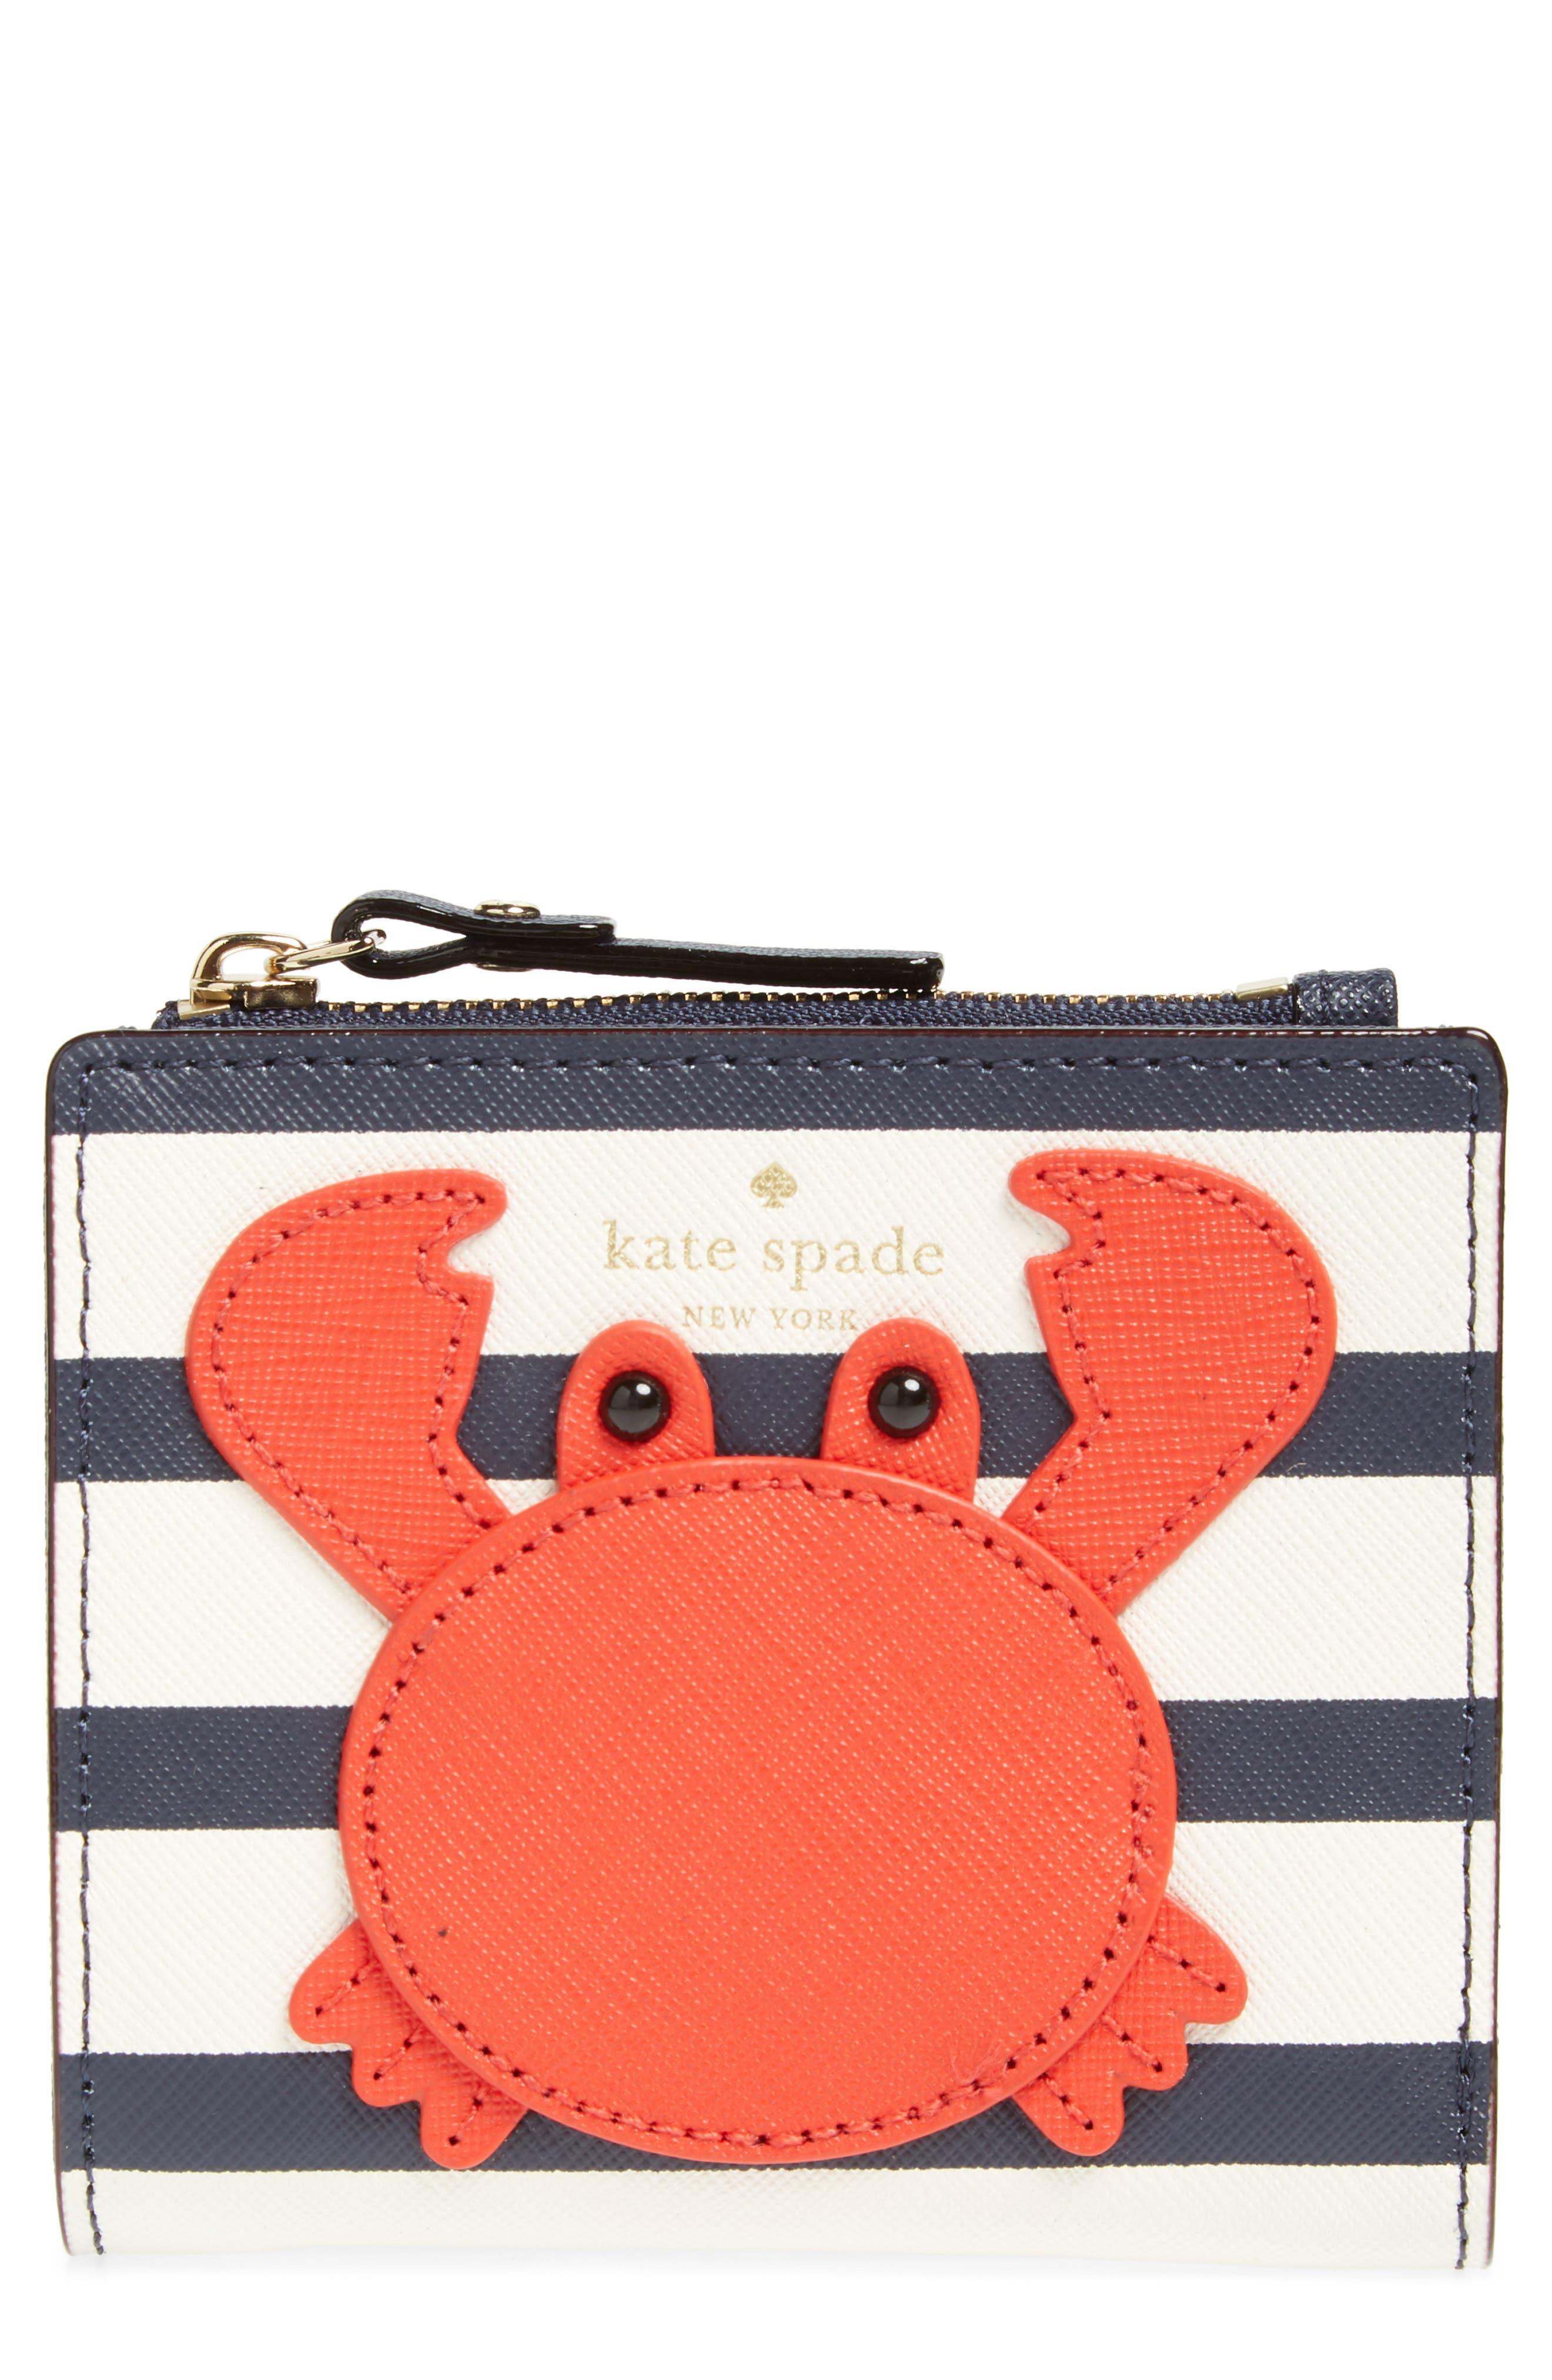 kate spade new york shore thing - stripe adalyn leather wallet